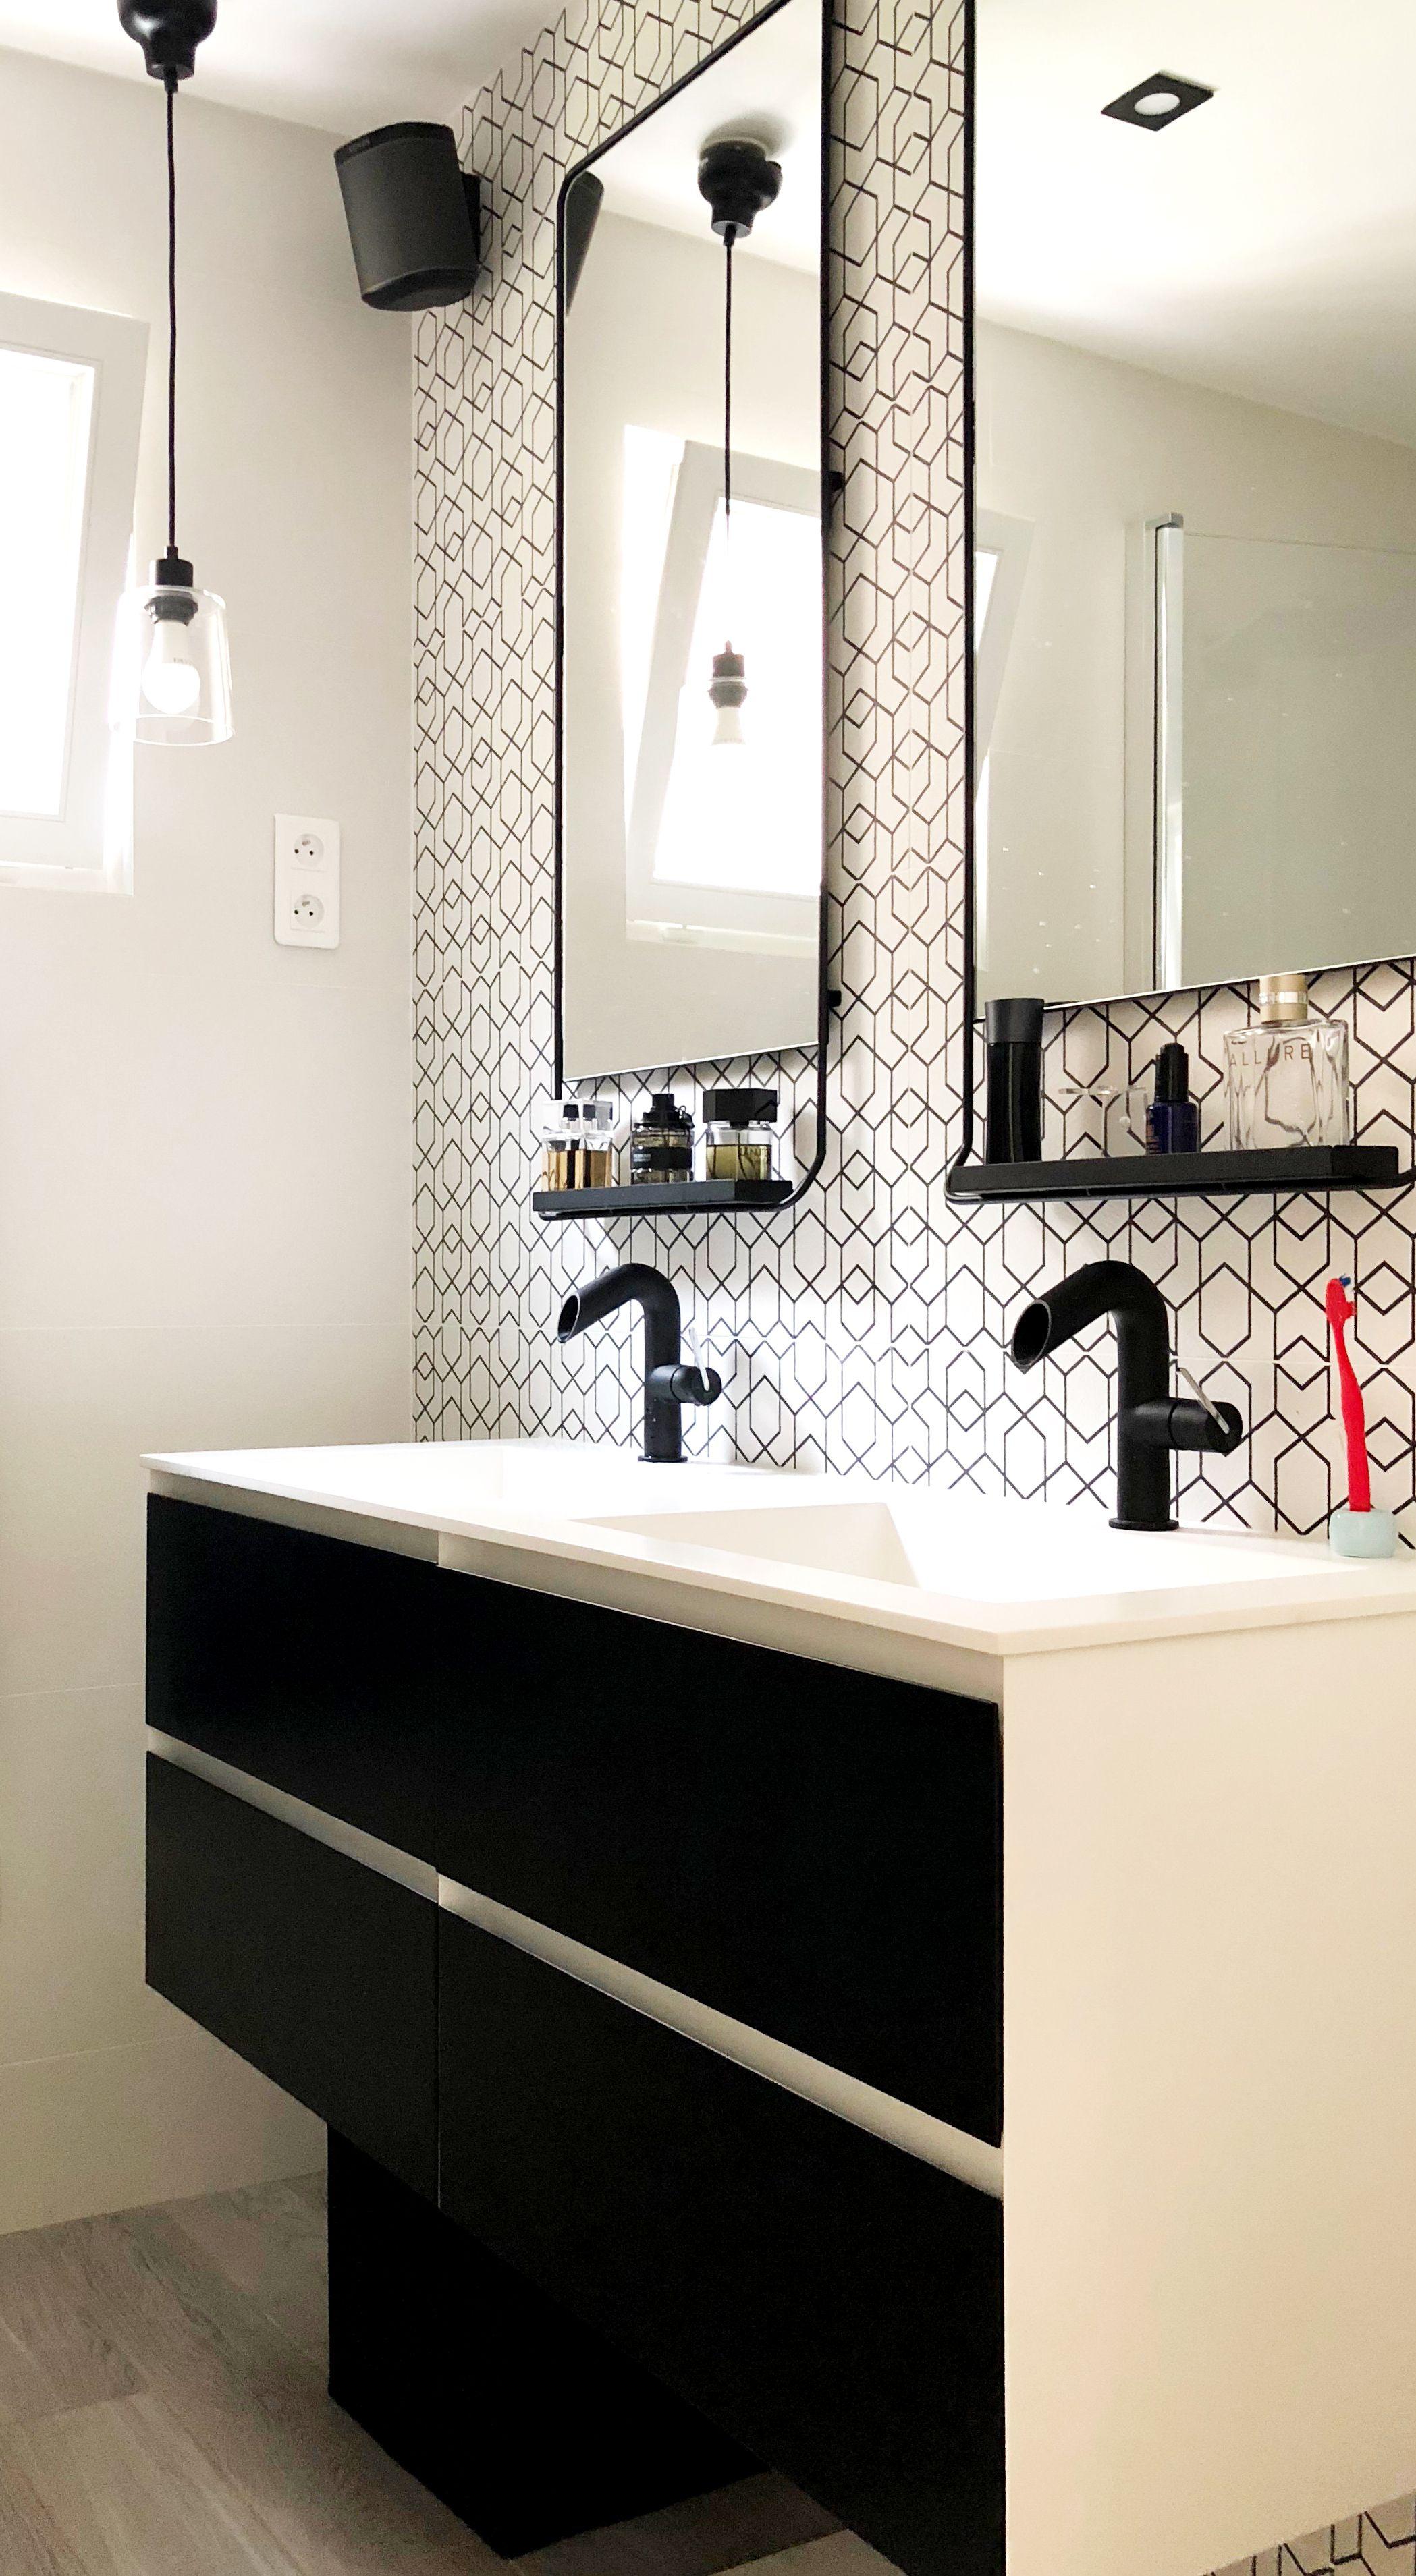 Epingle Sur Bathroom Inspiration Inspirations Salle De Bain